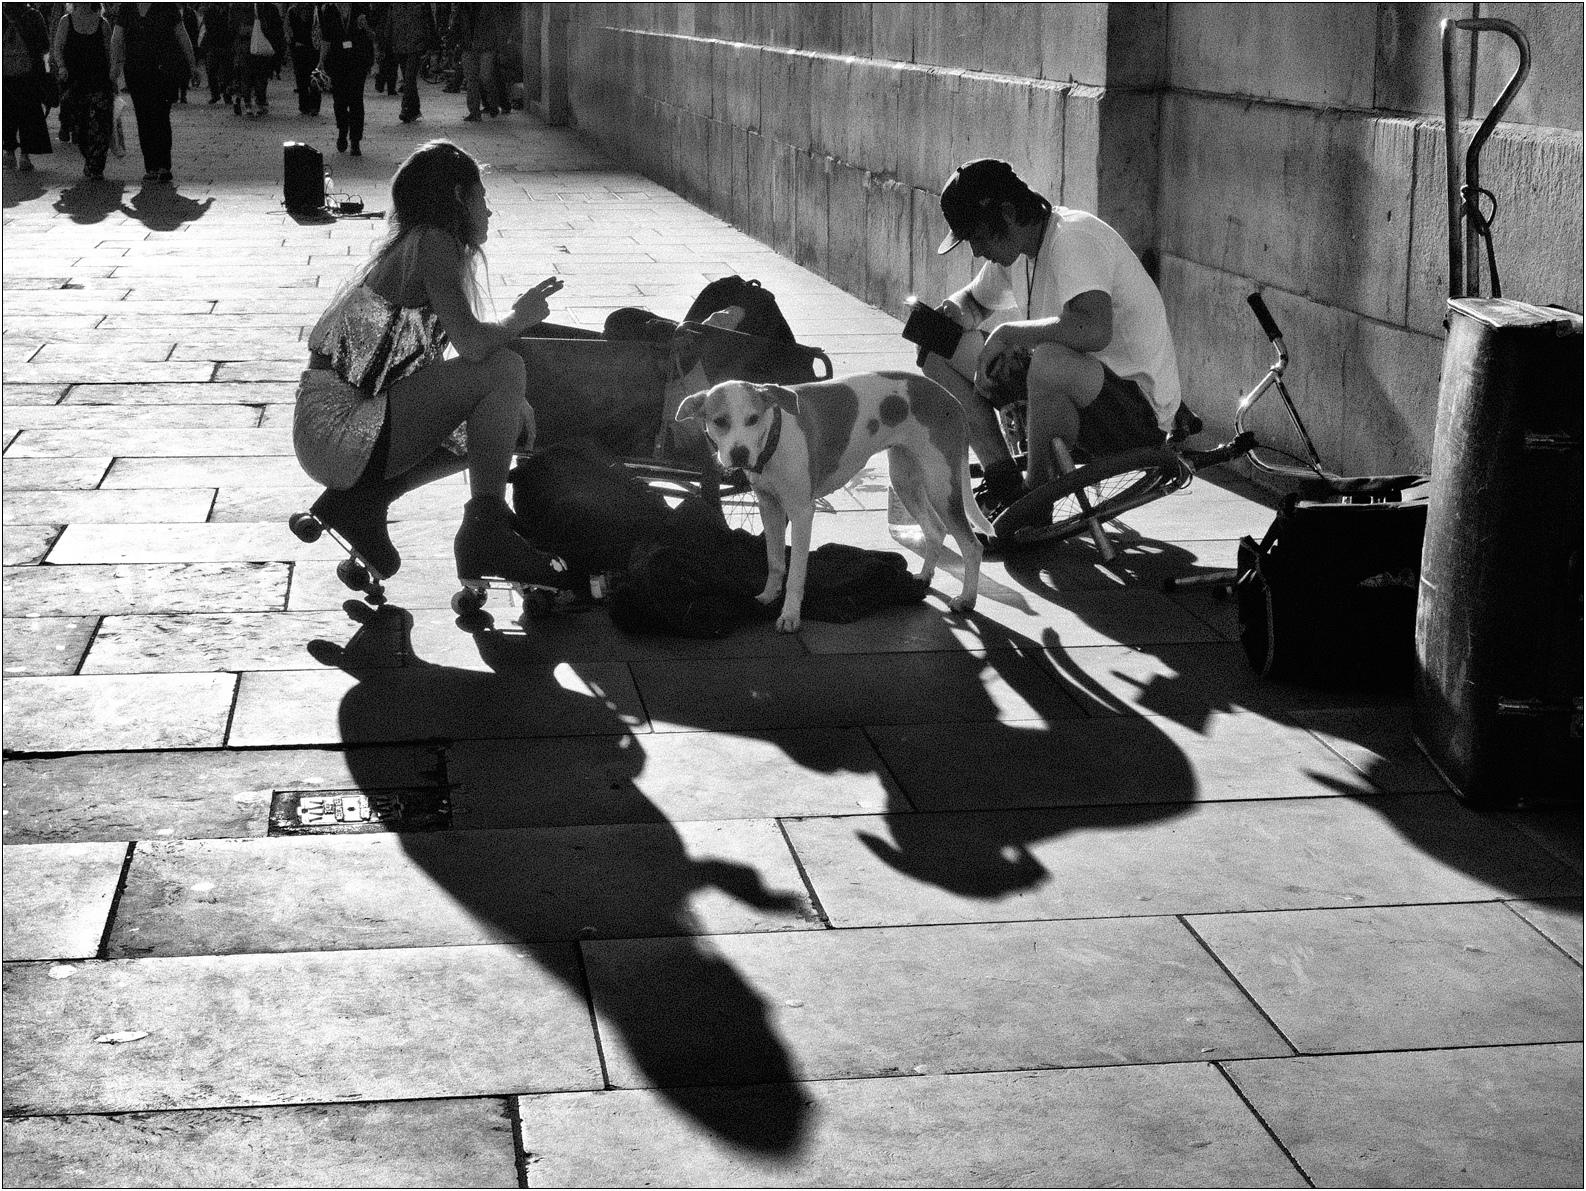 Stephen-Marsh-Buskers-Trafalgar-Square-9